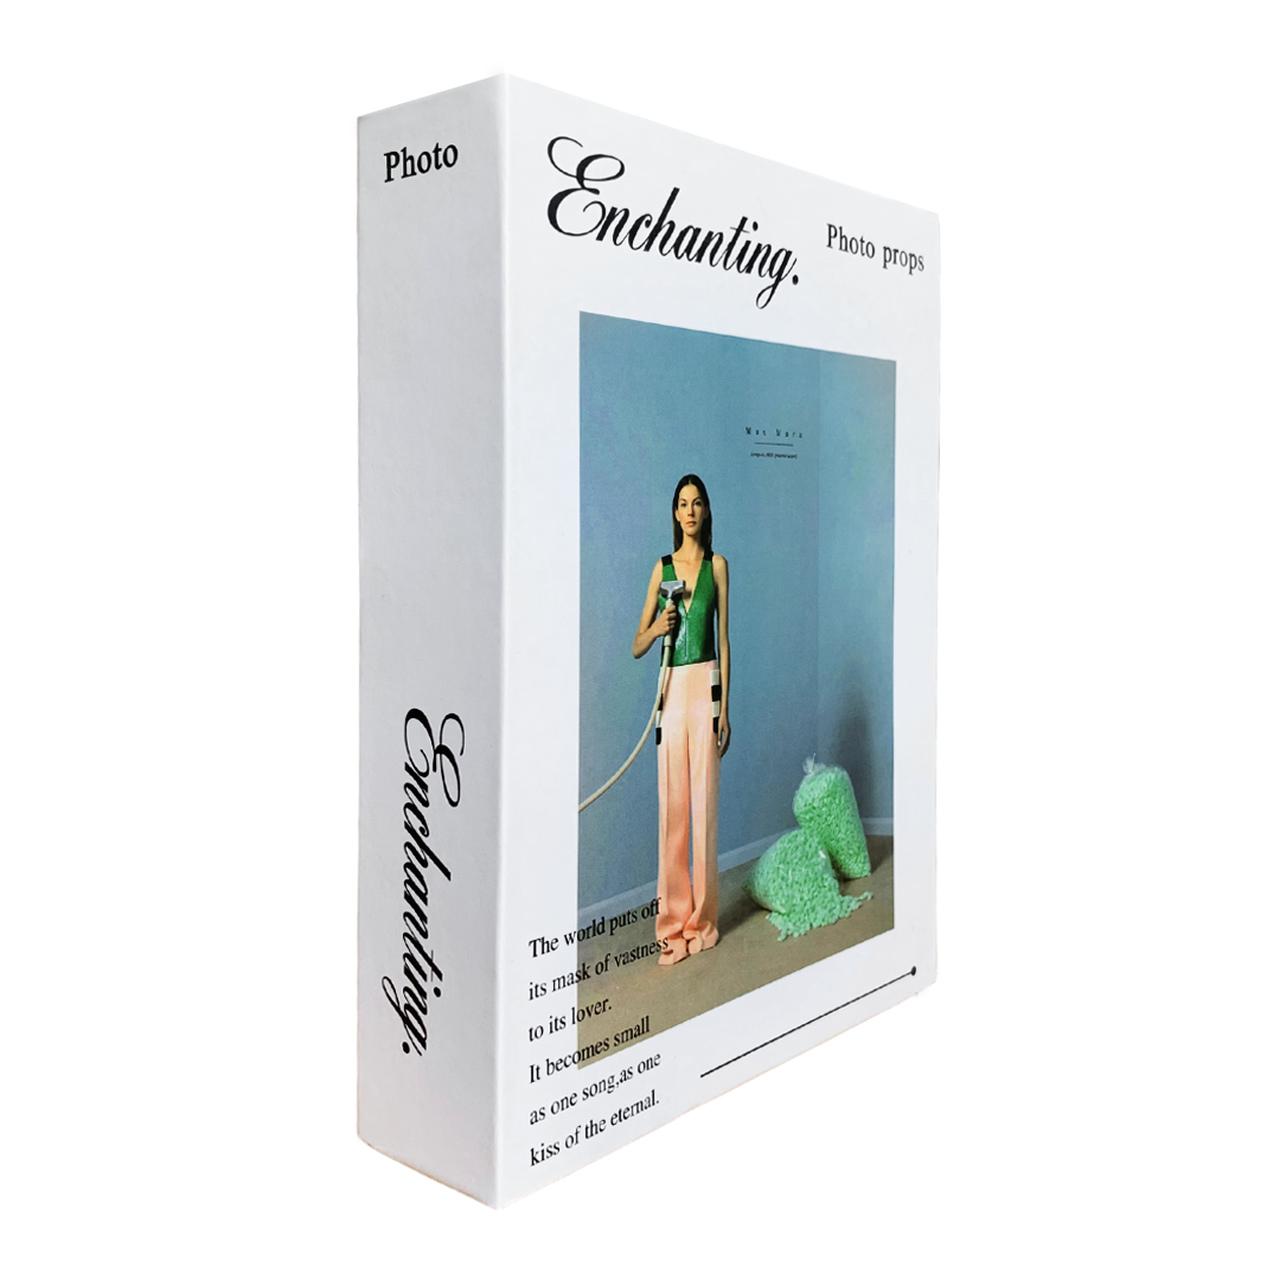 Caixa Livro Decorativa Enchanting